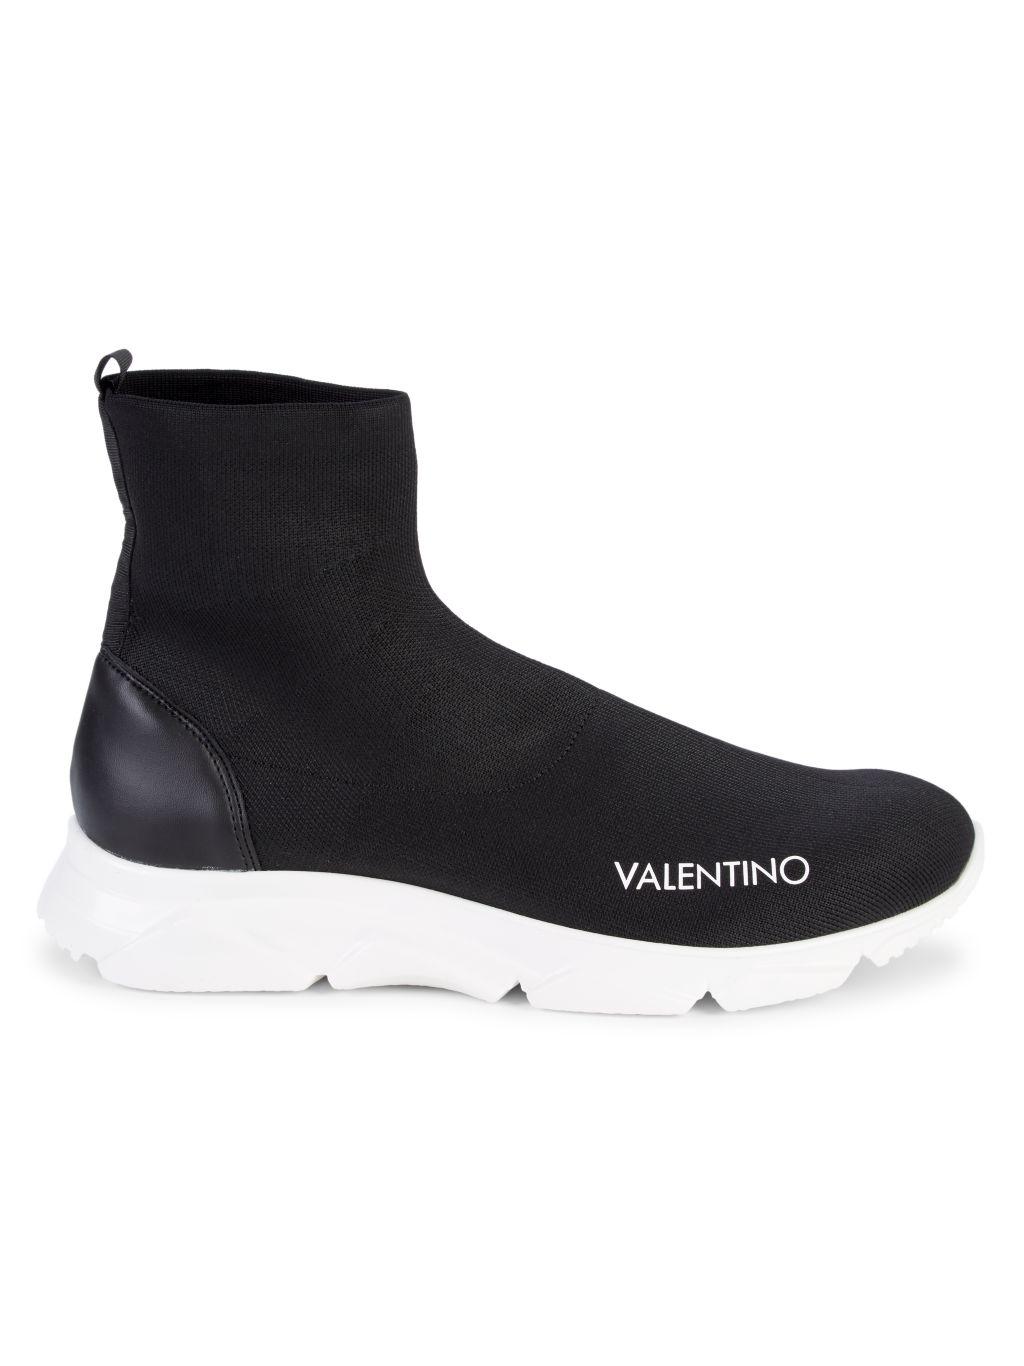 Valentino by Mario Valentino Tom Space Sock Runners